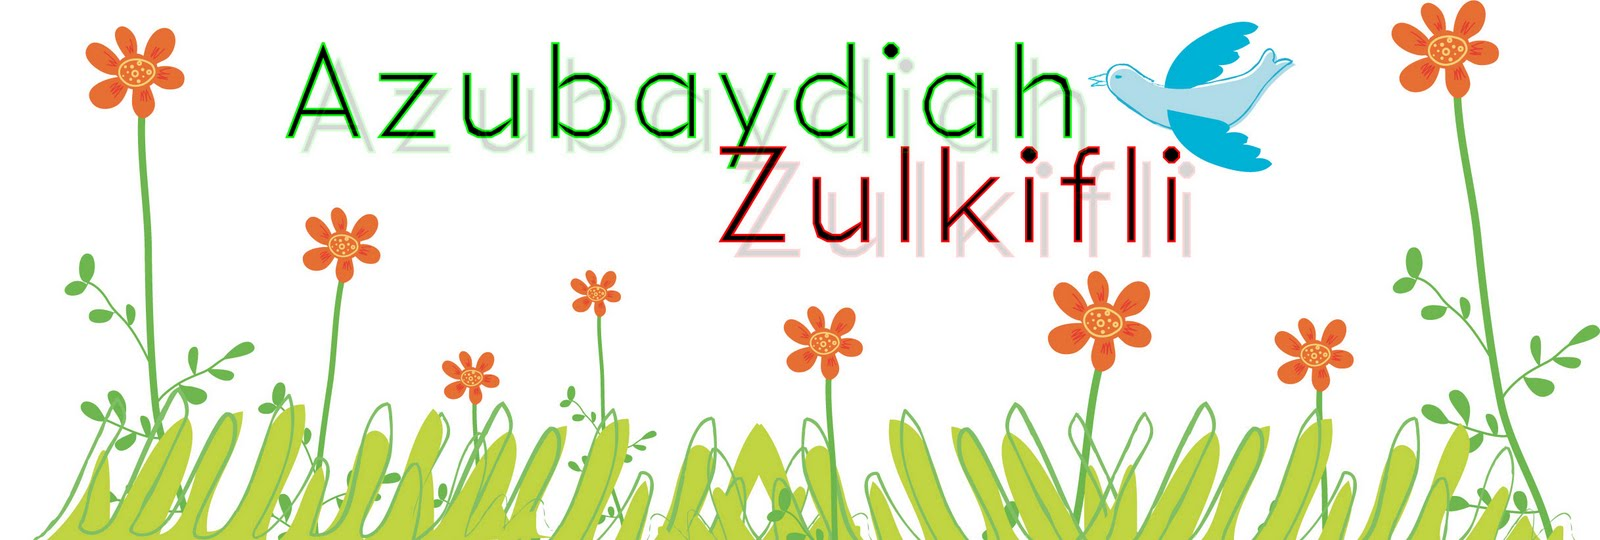 Azubaydiah Zulkifli